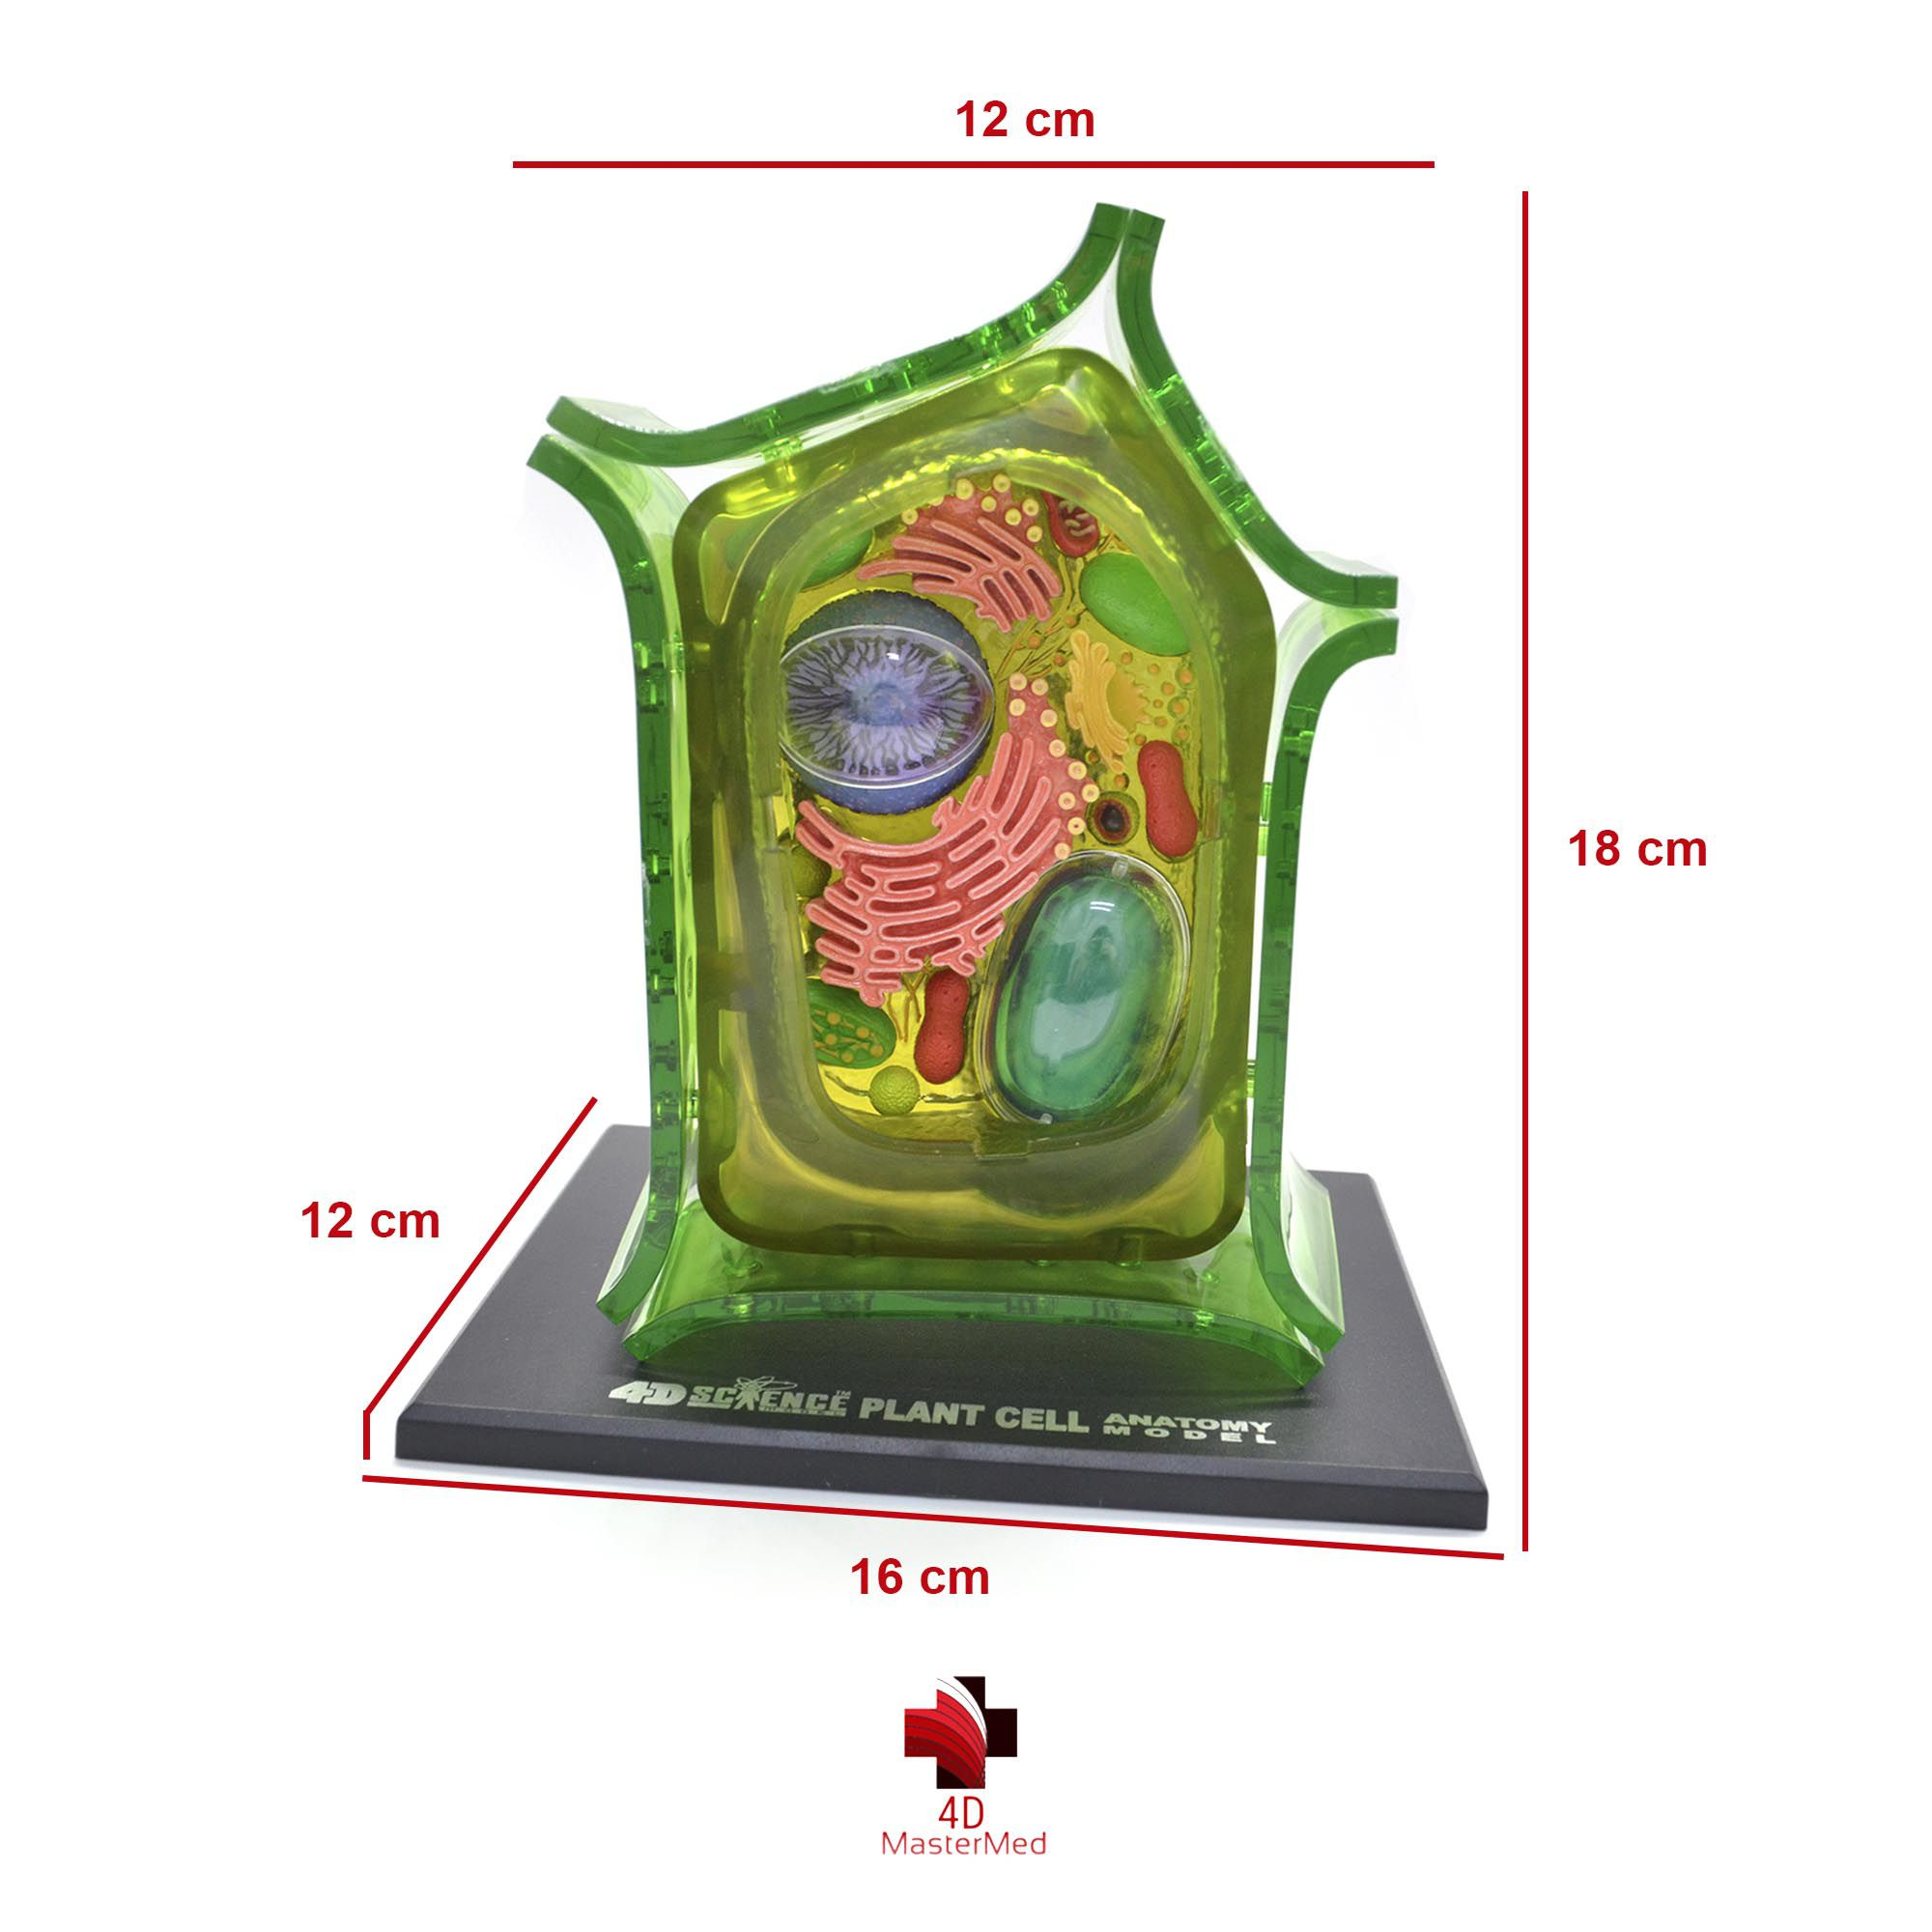 Anatomia da Célula Vegetal